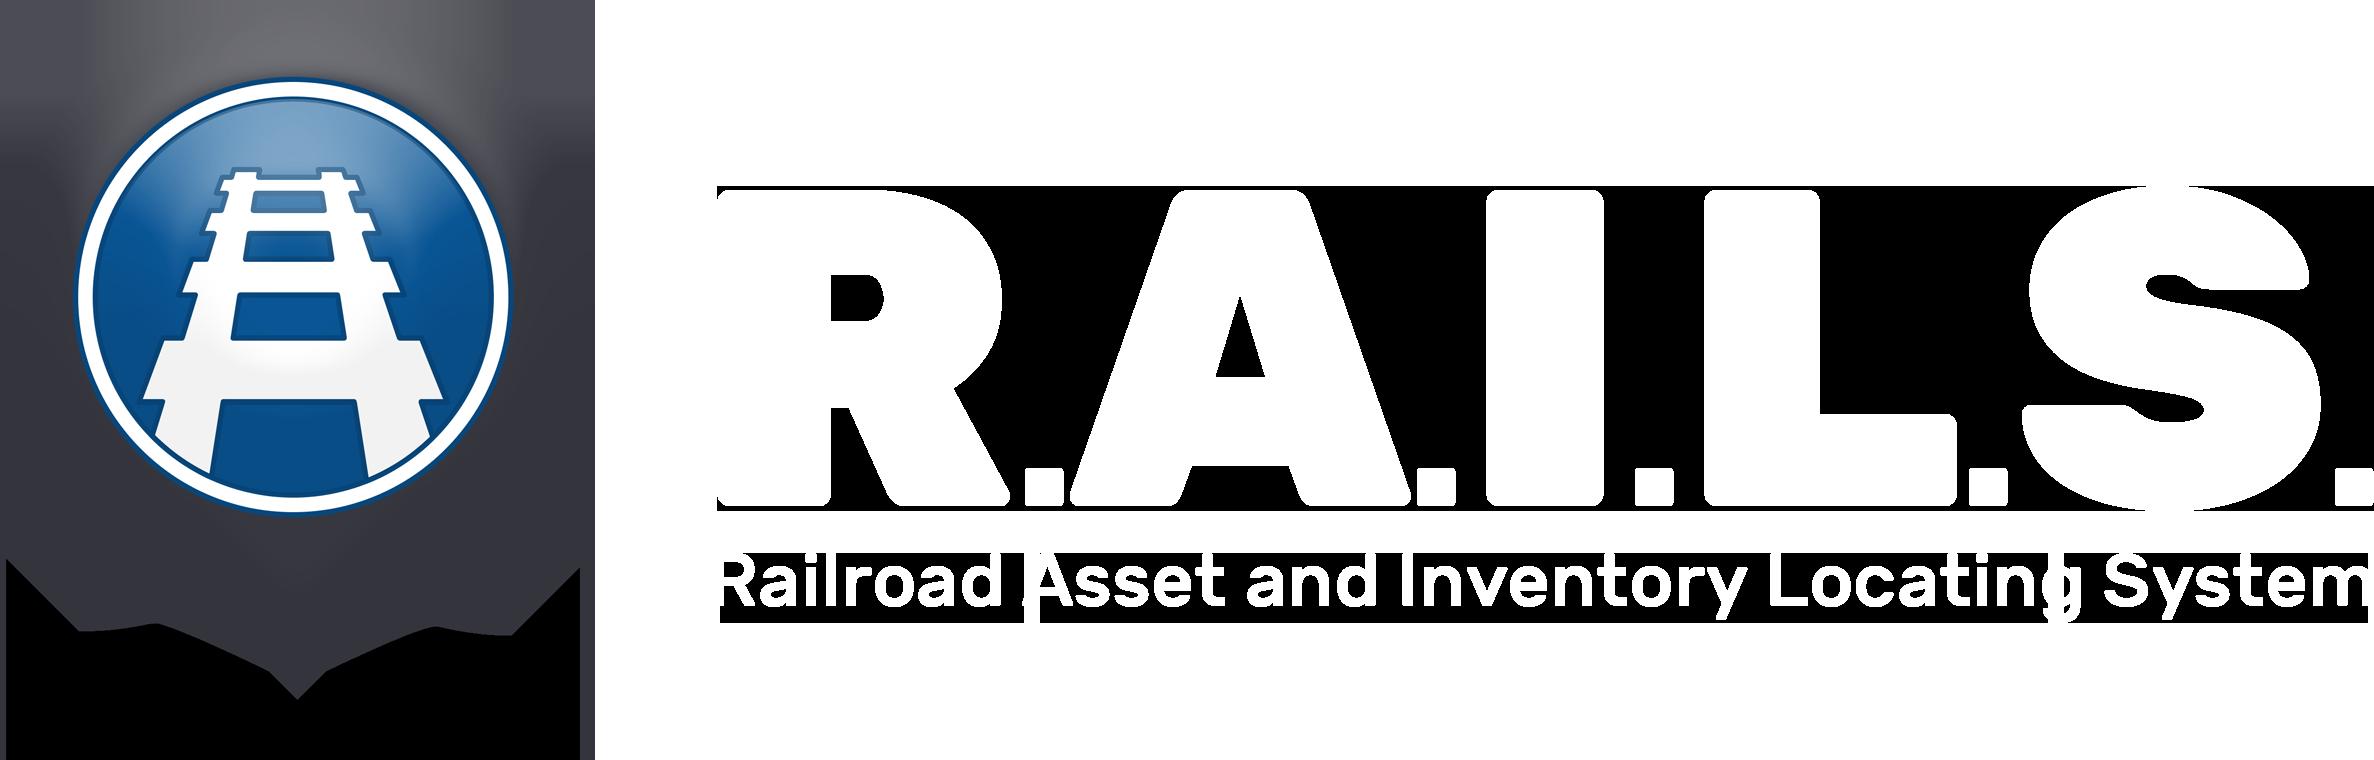 R.A.I.L.S.